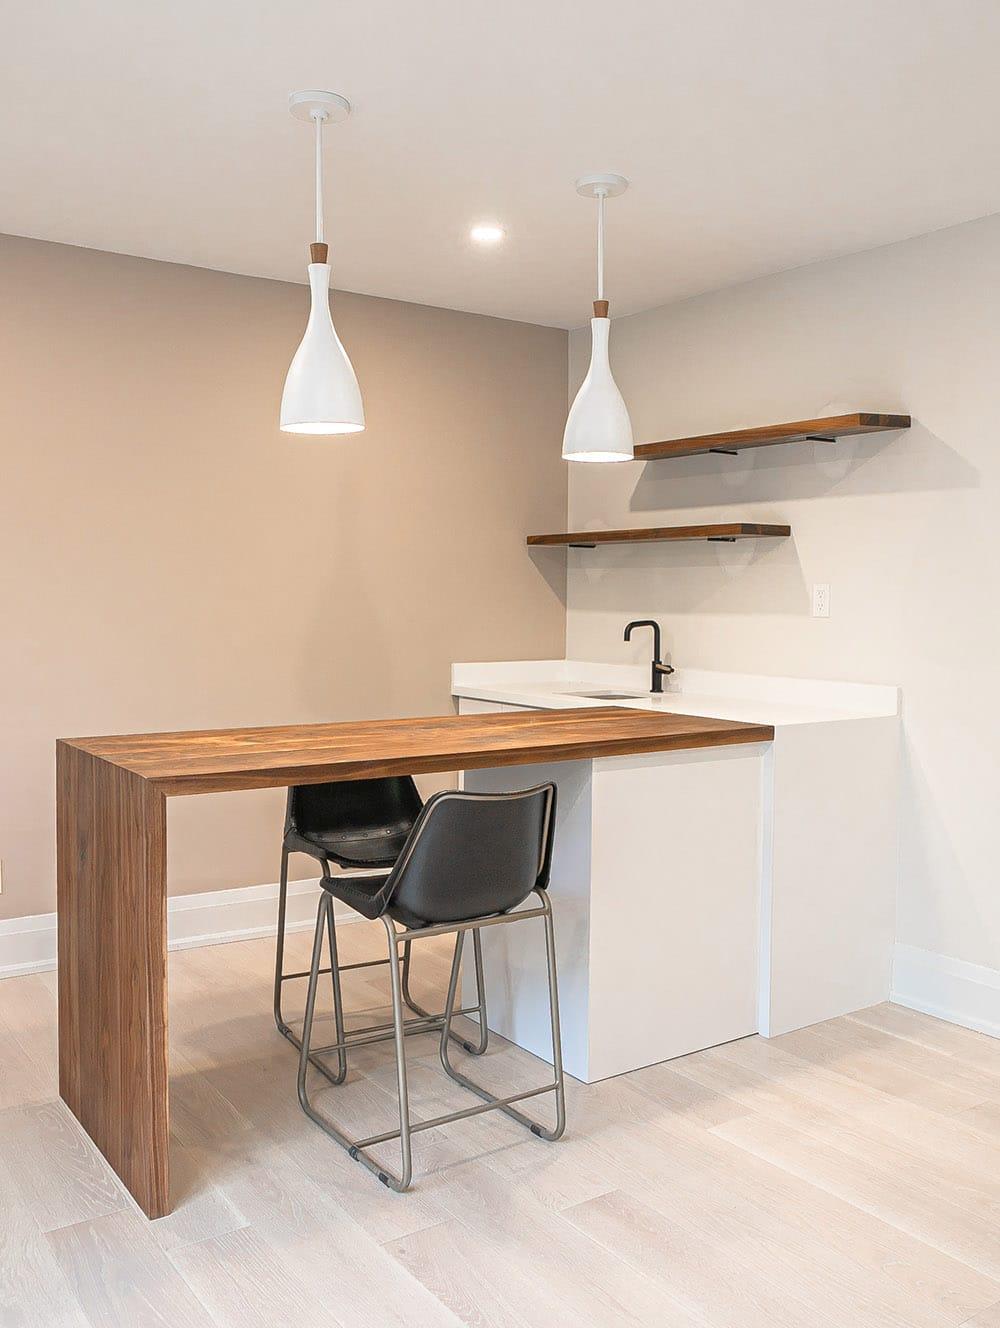 wood countertop kitchen island